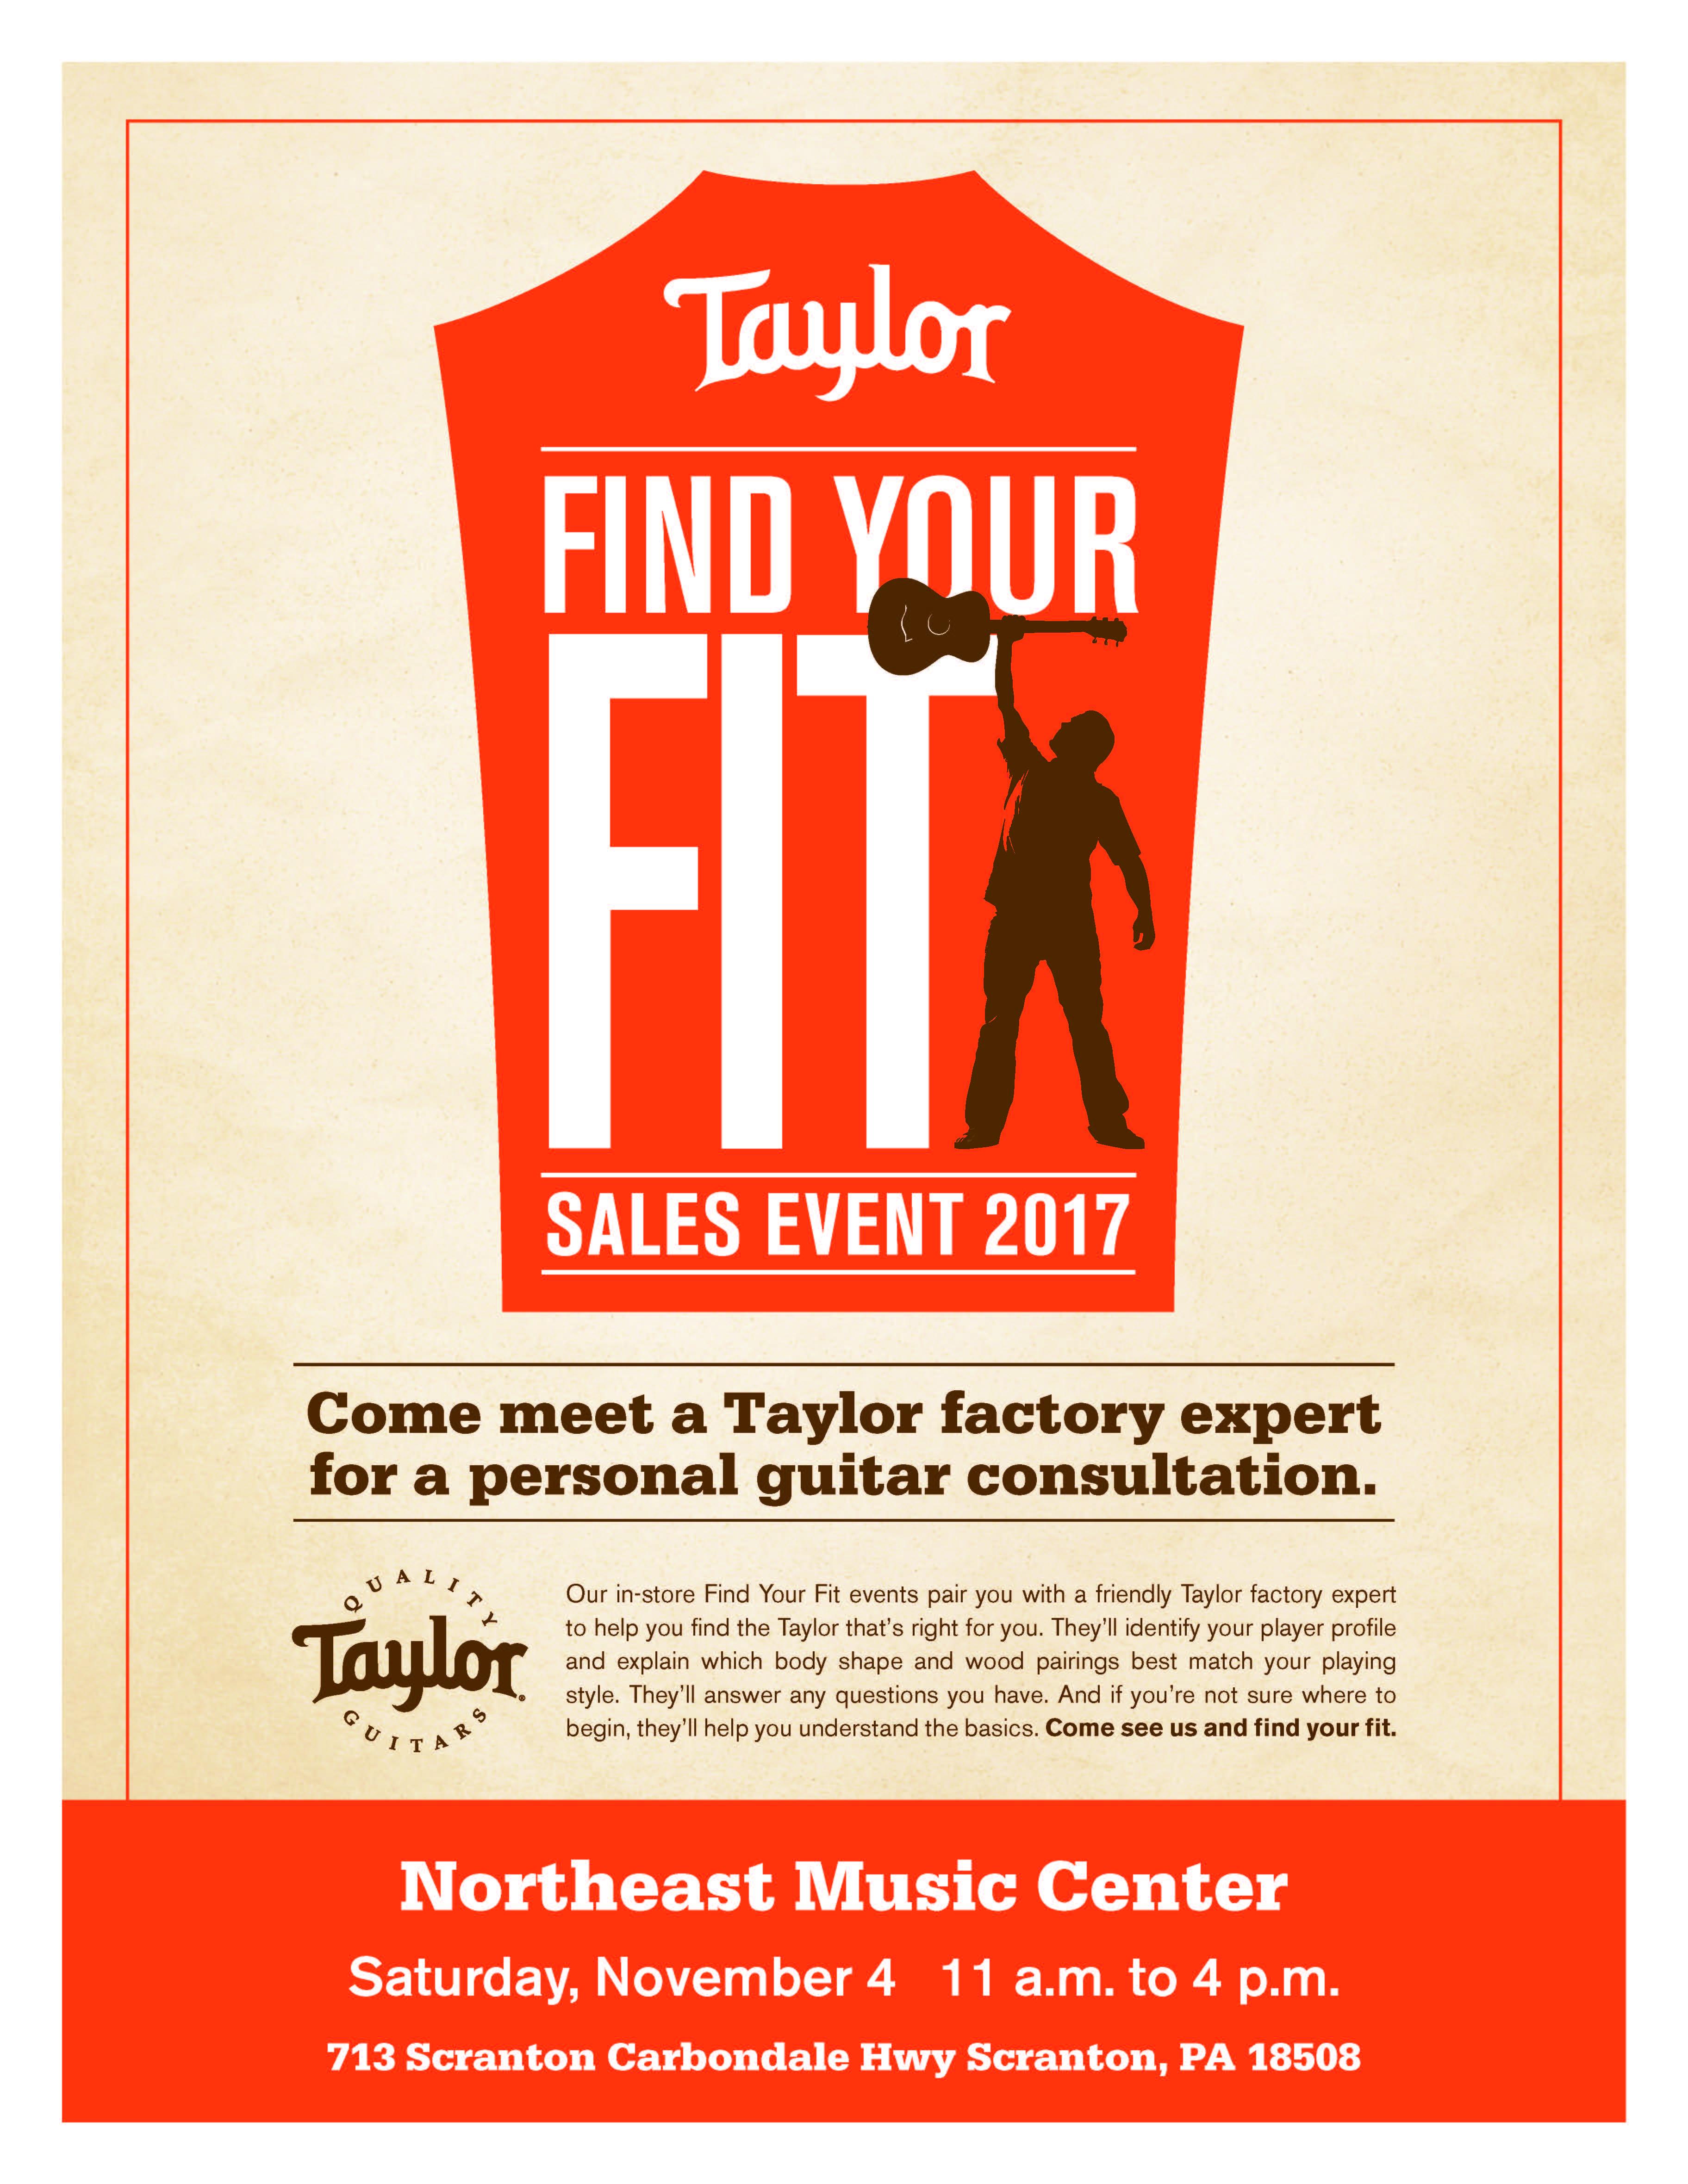 tg-fyf-flyer-northeastmusiccenter.jpg